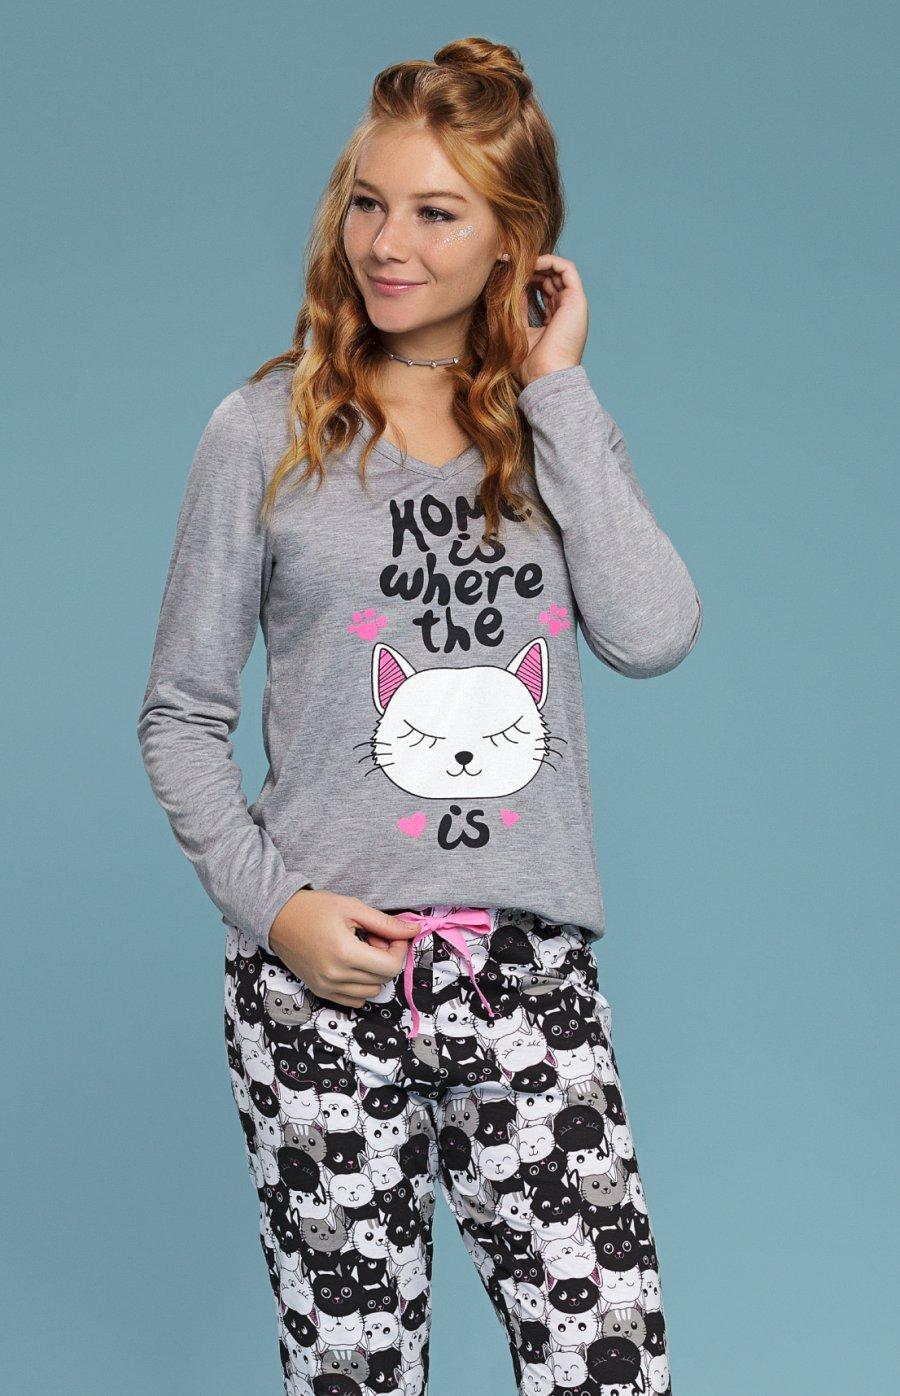 Pijama Plus Size 1/2 Malha Black Cat PROMO Inverno 2018